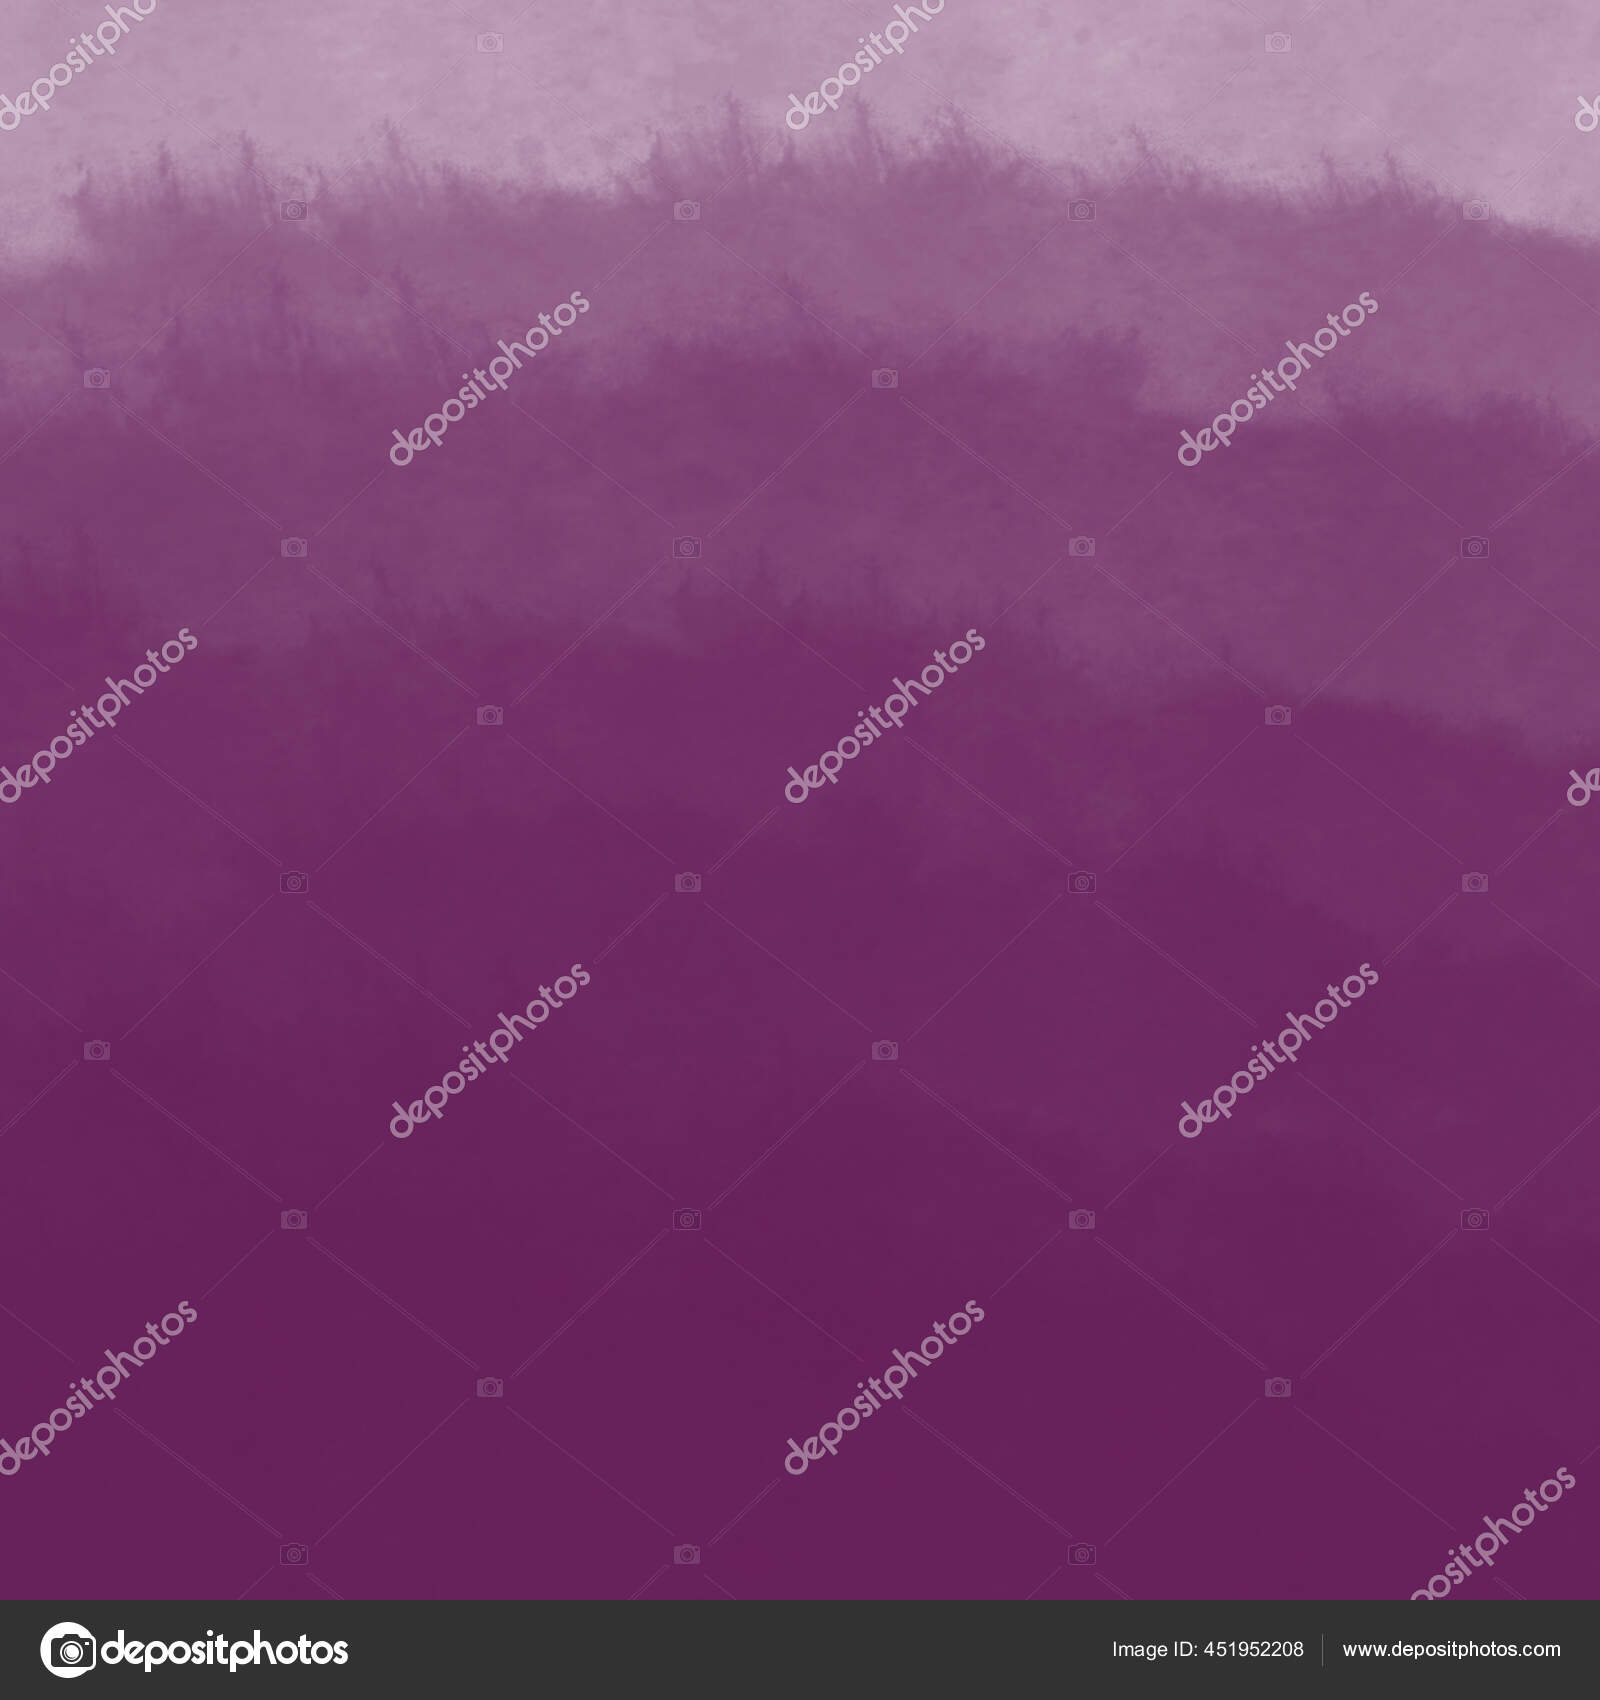 Burgundy Color Academic Gradient Basic Drawings And Paintings Vector C Magicfairy 451952208